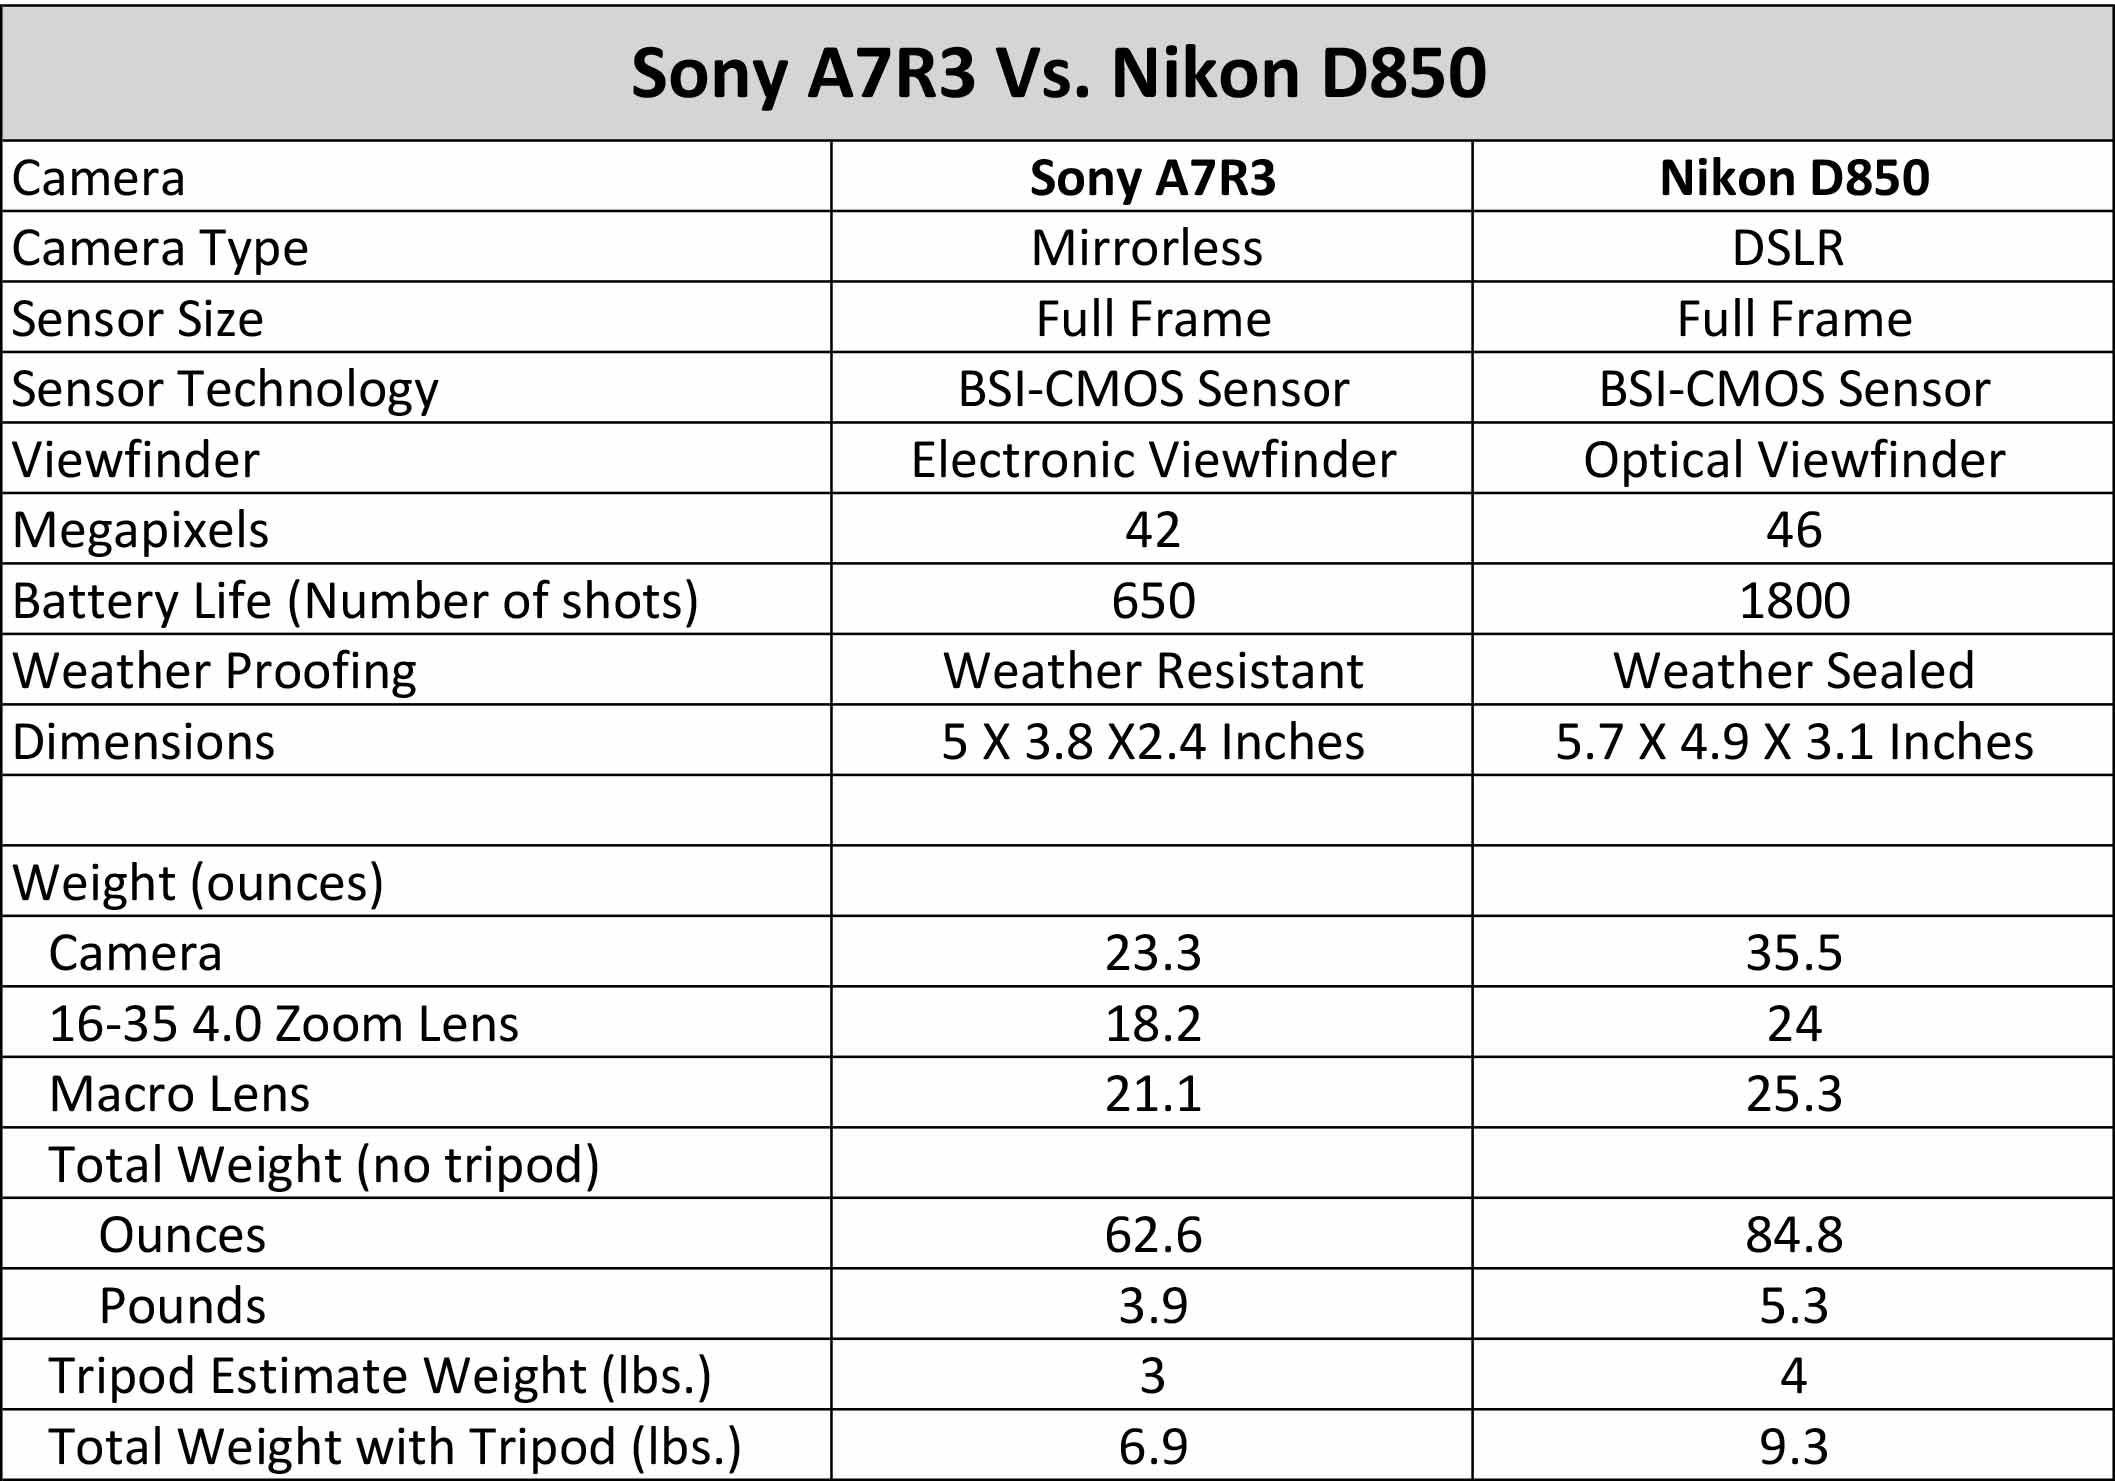 Sony versus Nikon